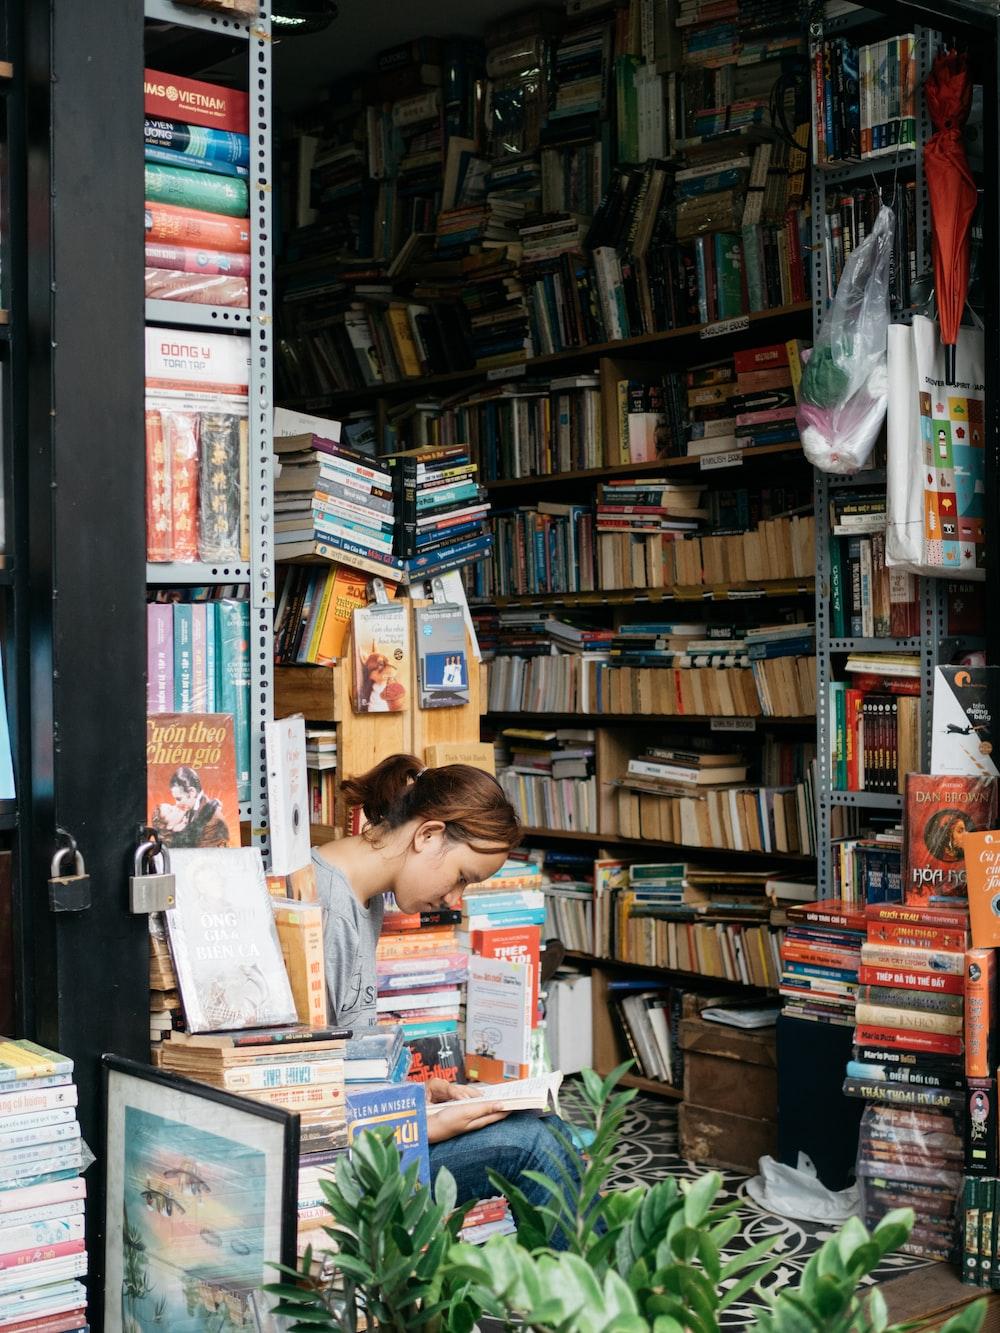 woman reading book in between books in shelf